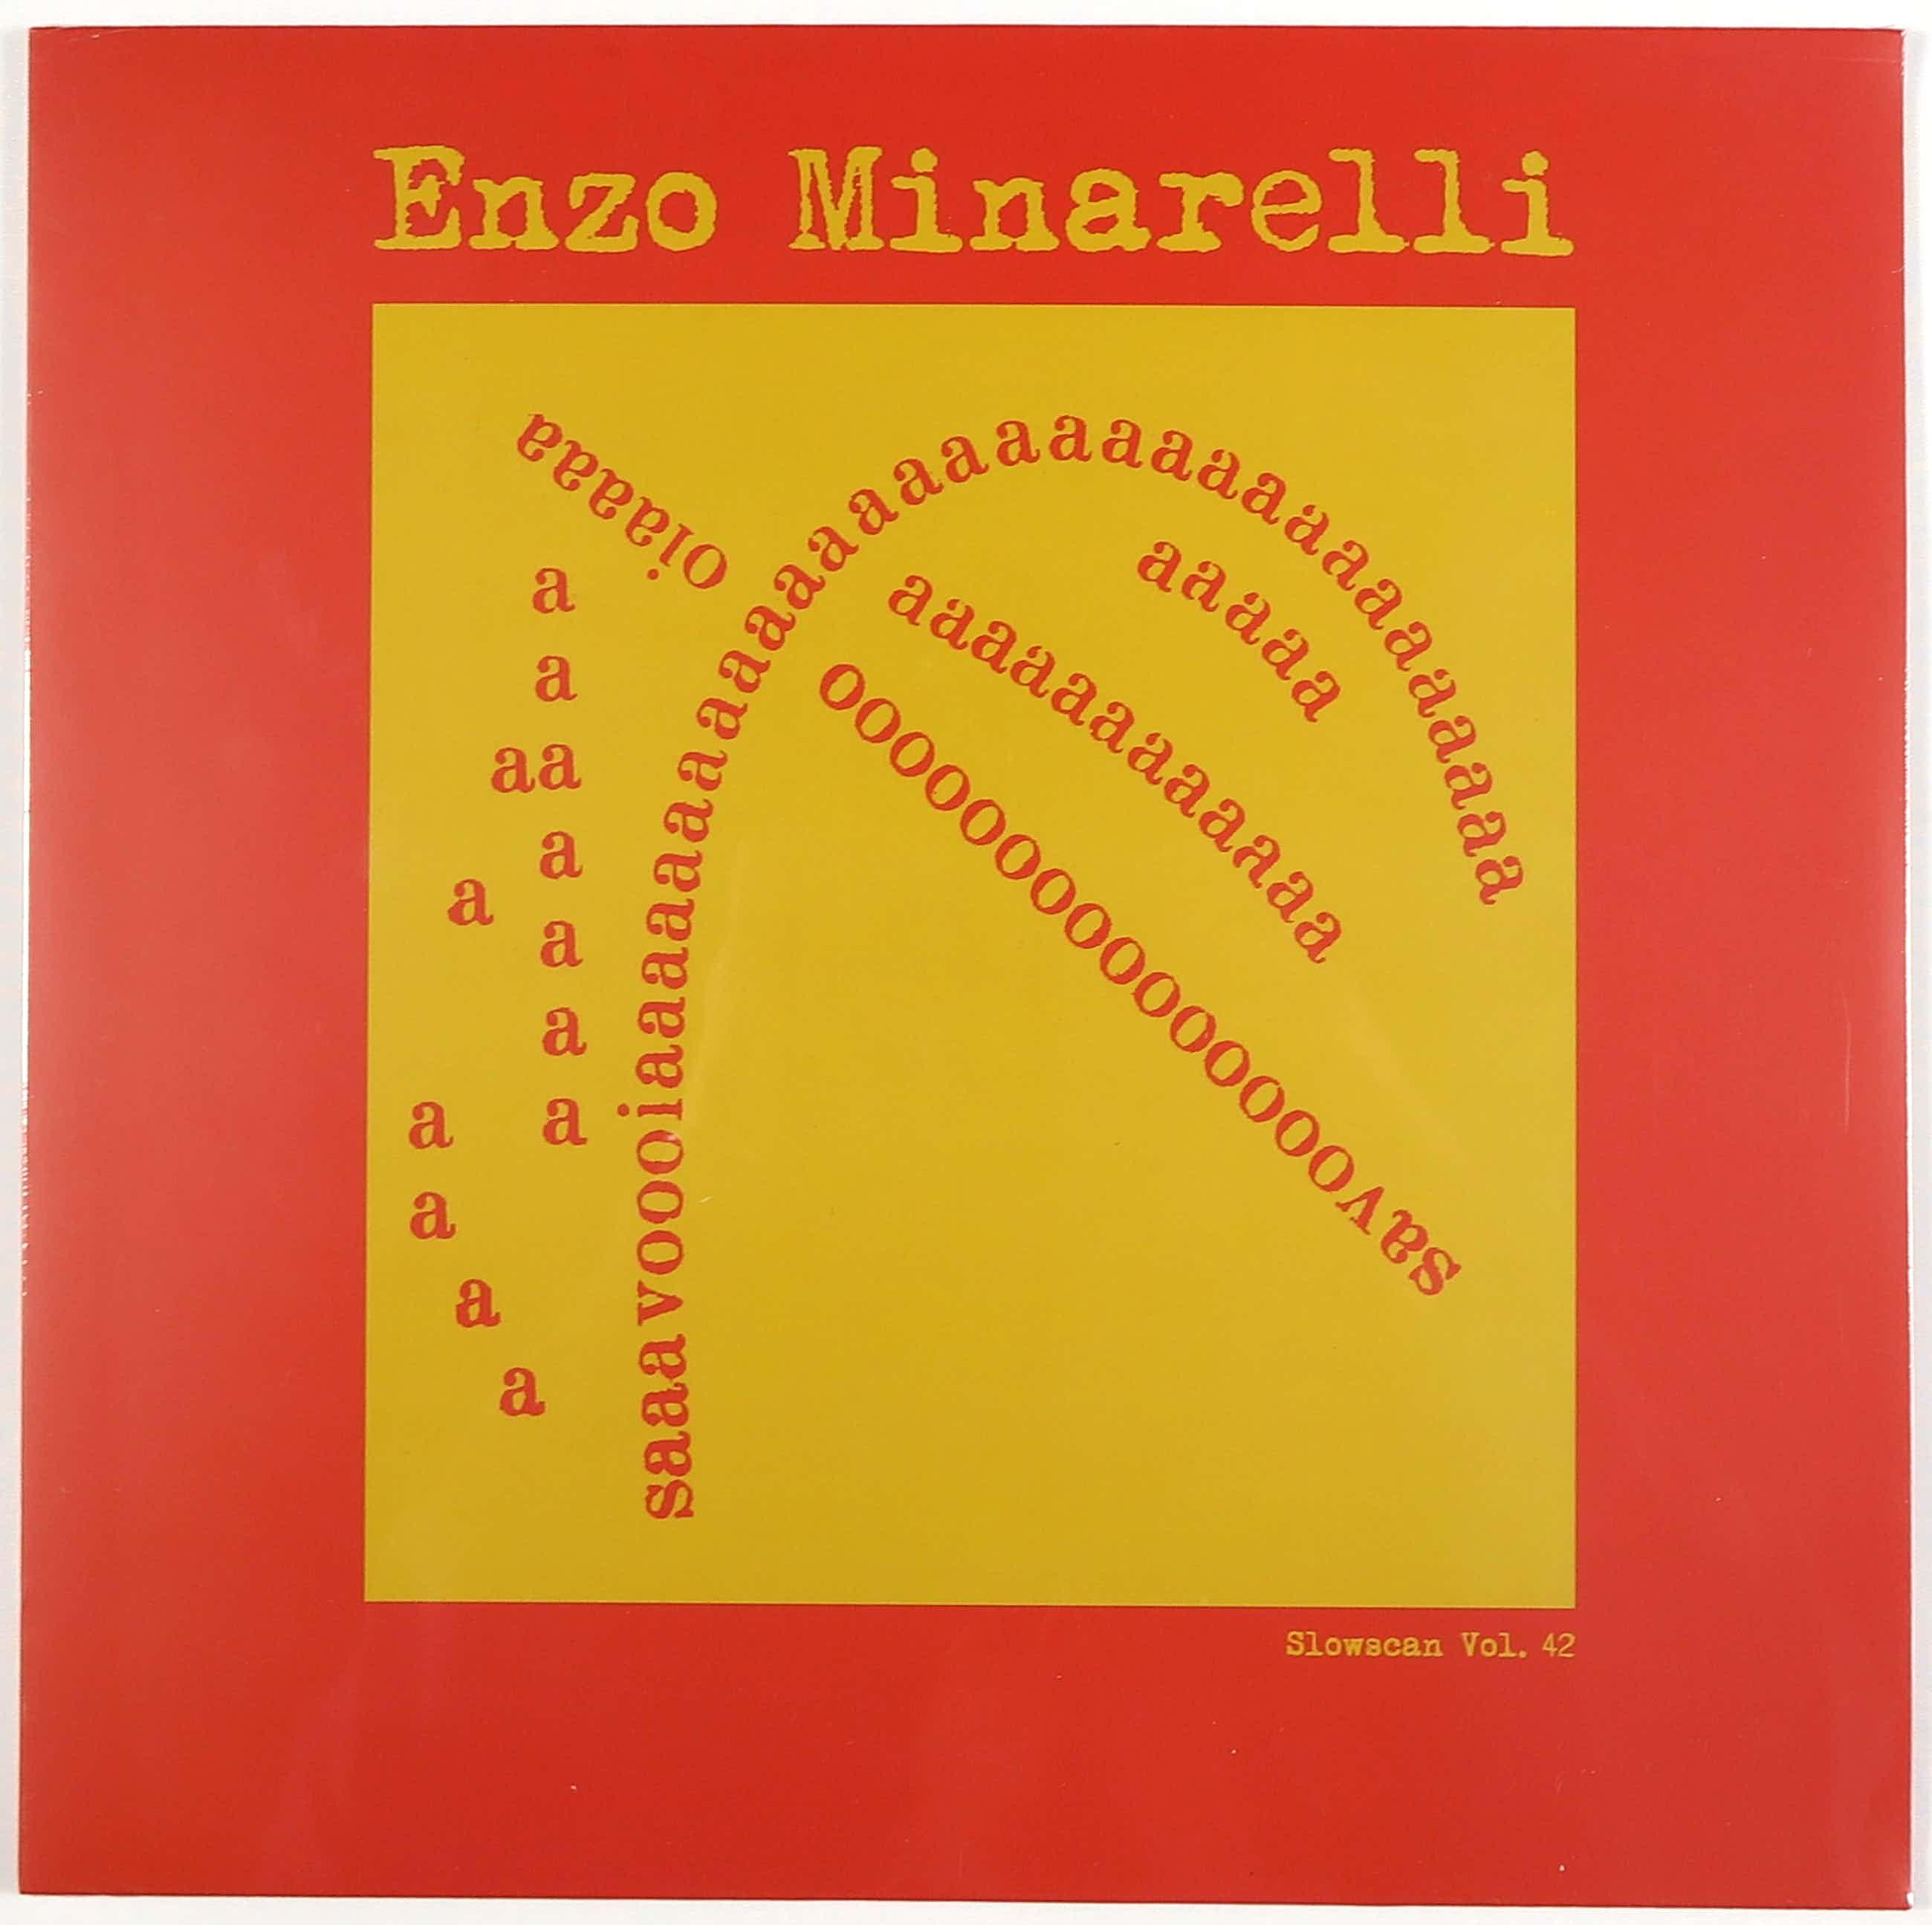 Enzo Minarelli - Live In San Francisco kopen? Bied vanaf 10!